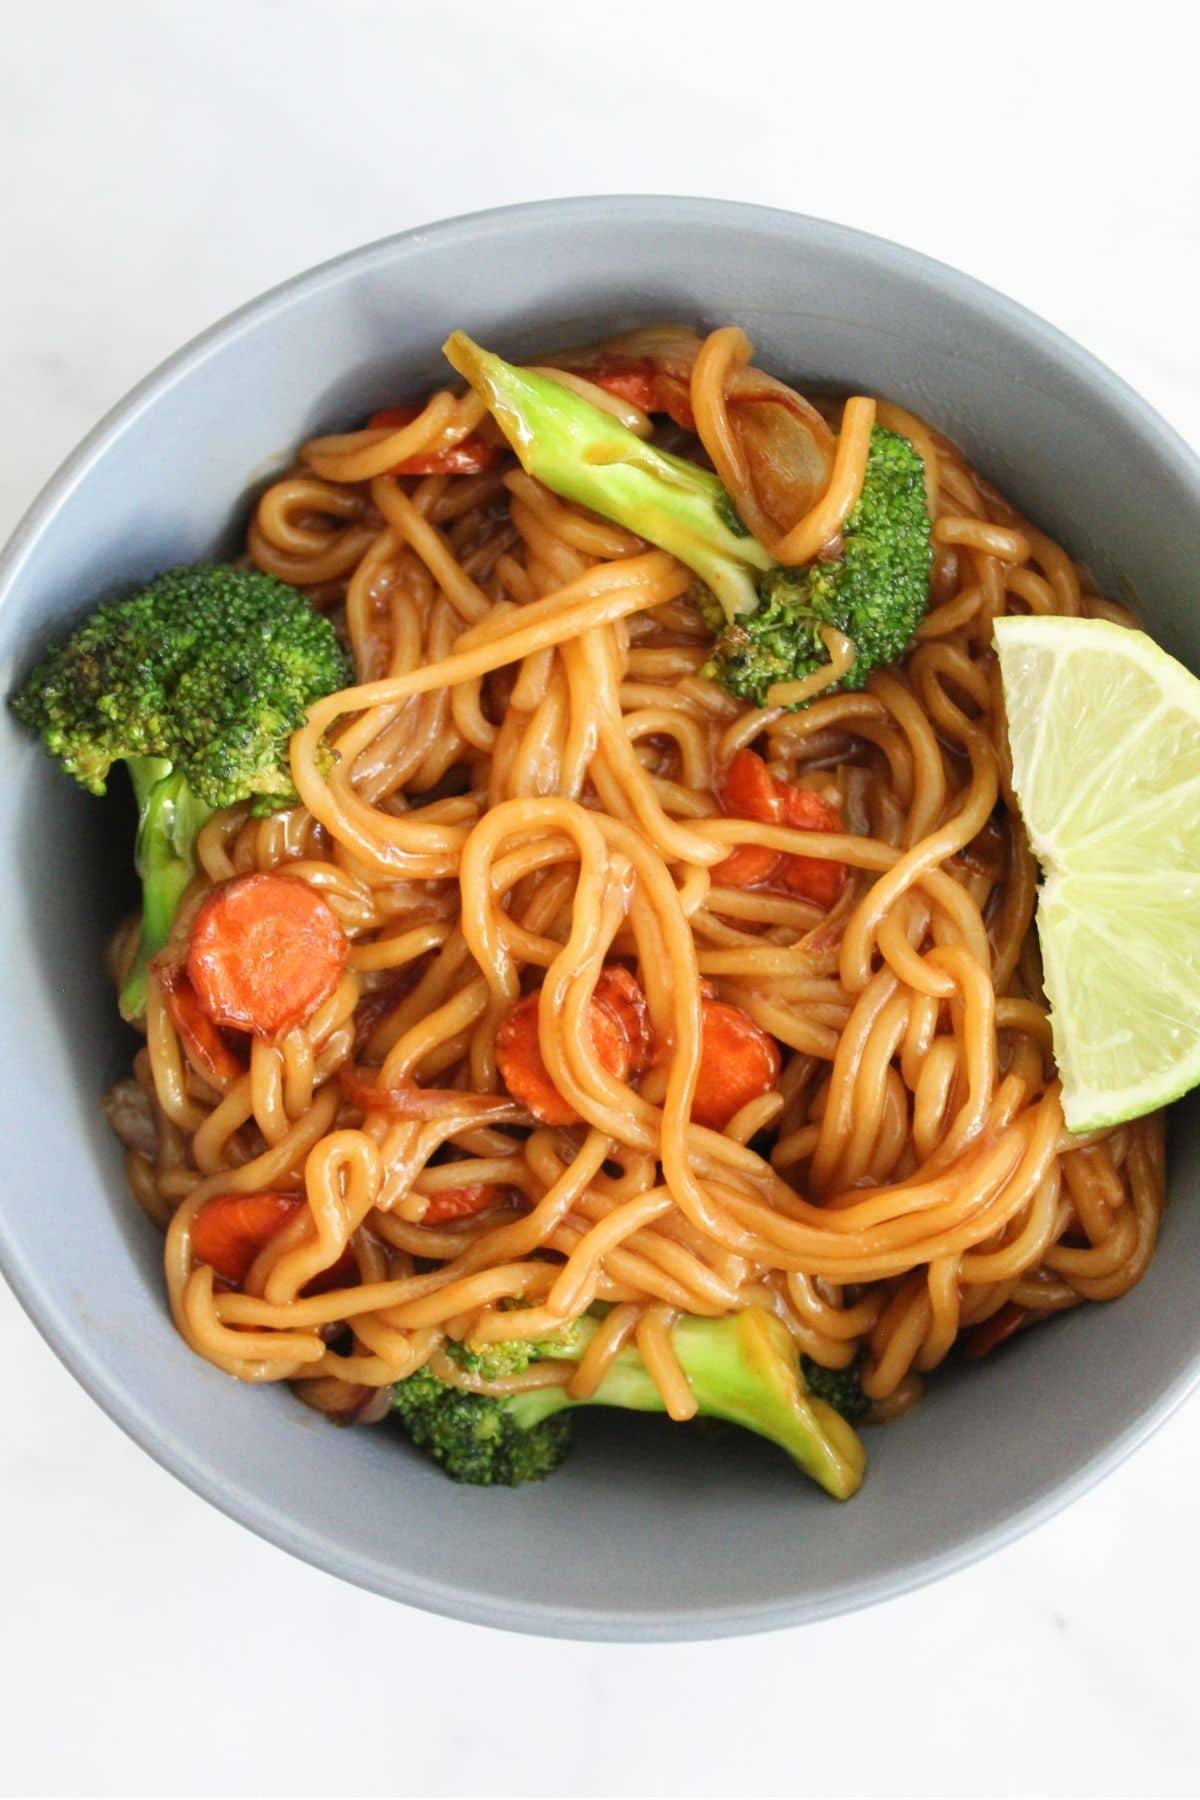 vegan ramen stir fry with carrots, shallots and broccoli